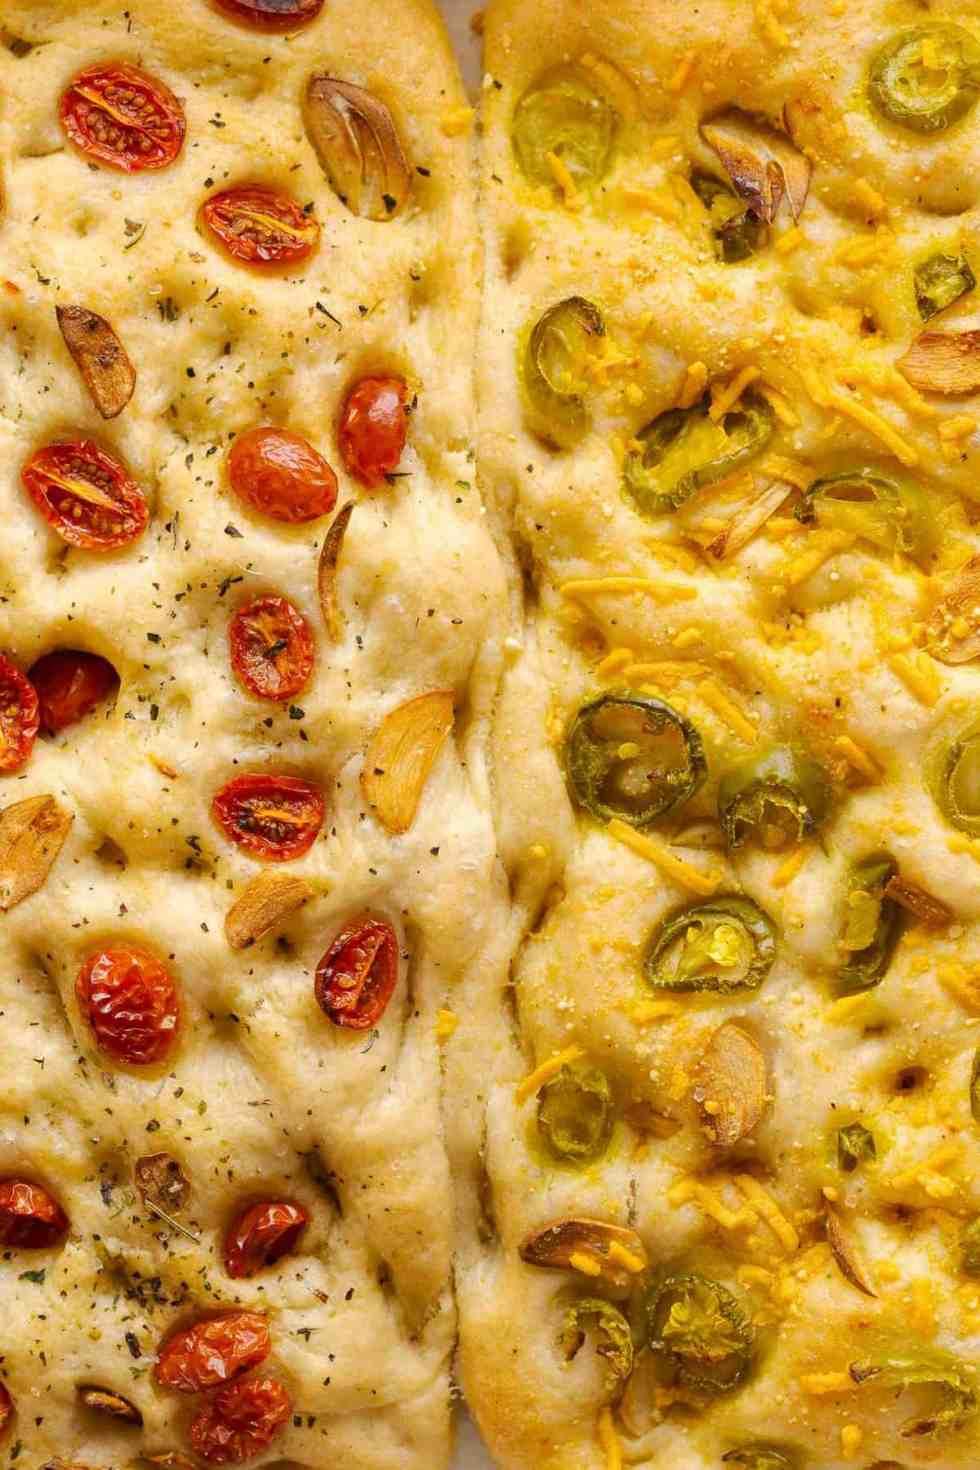 Left: Jalapeño & (Vegan) Cheese Focaccia. Right: Tomato, Herb & Garlic Focaccia